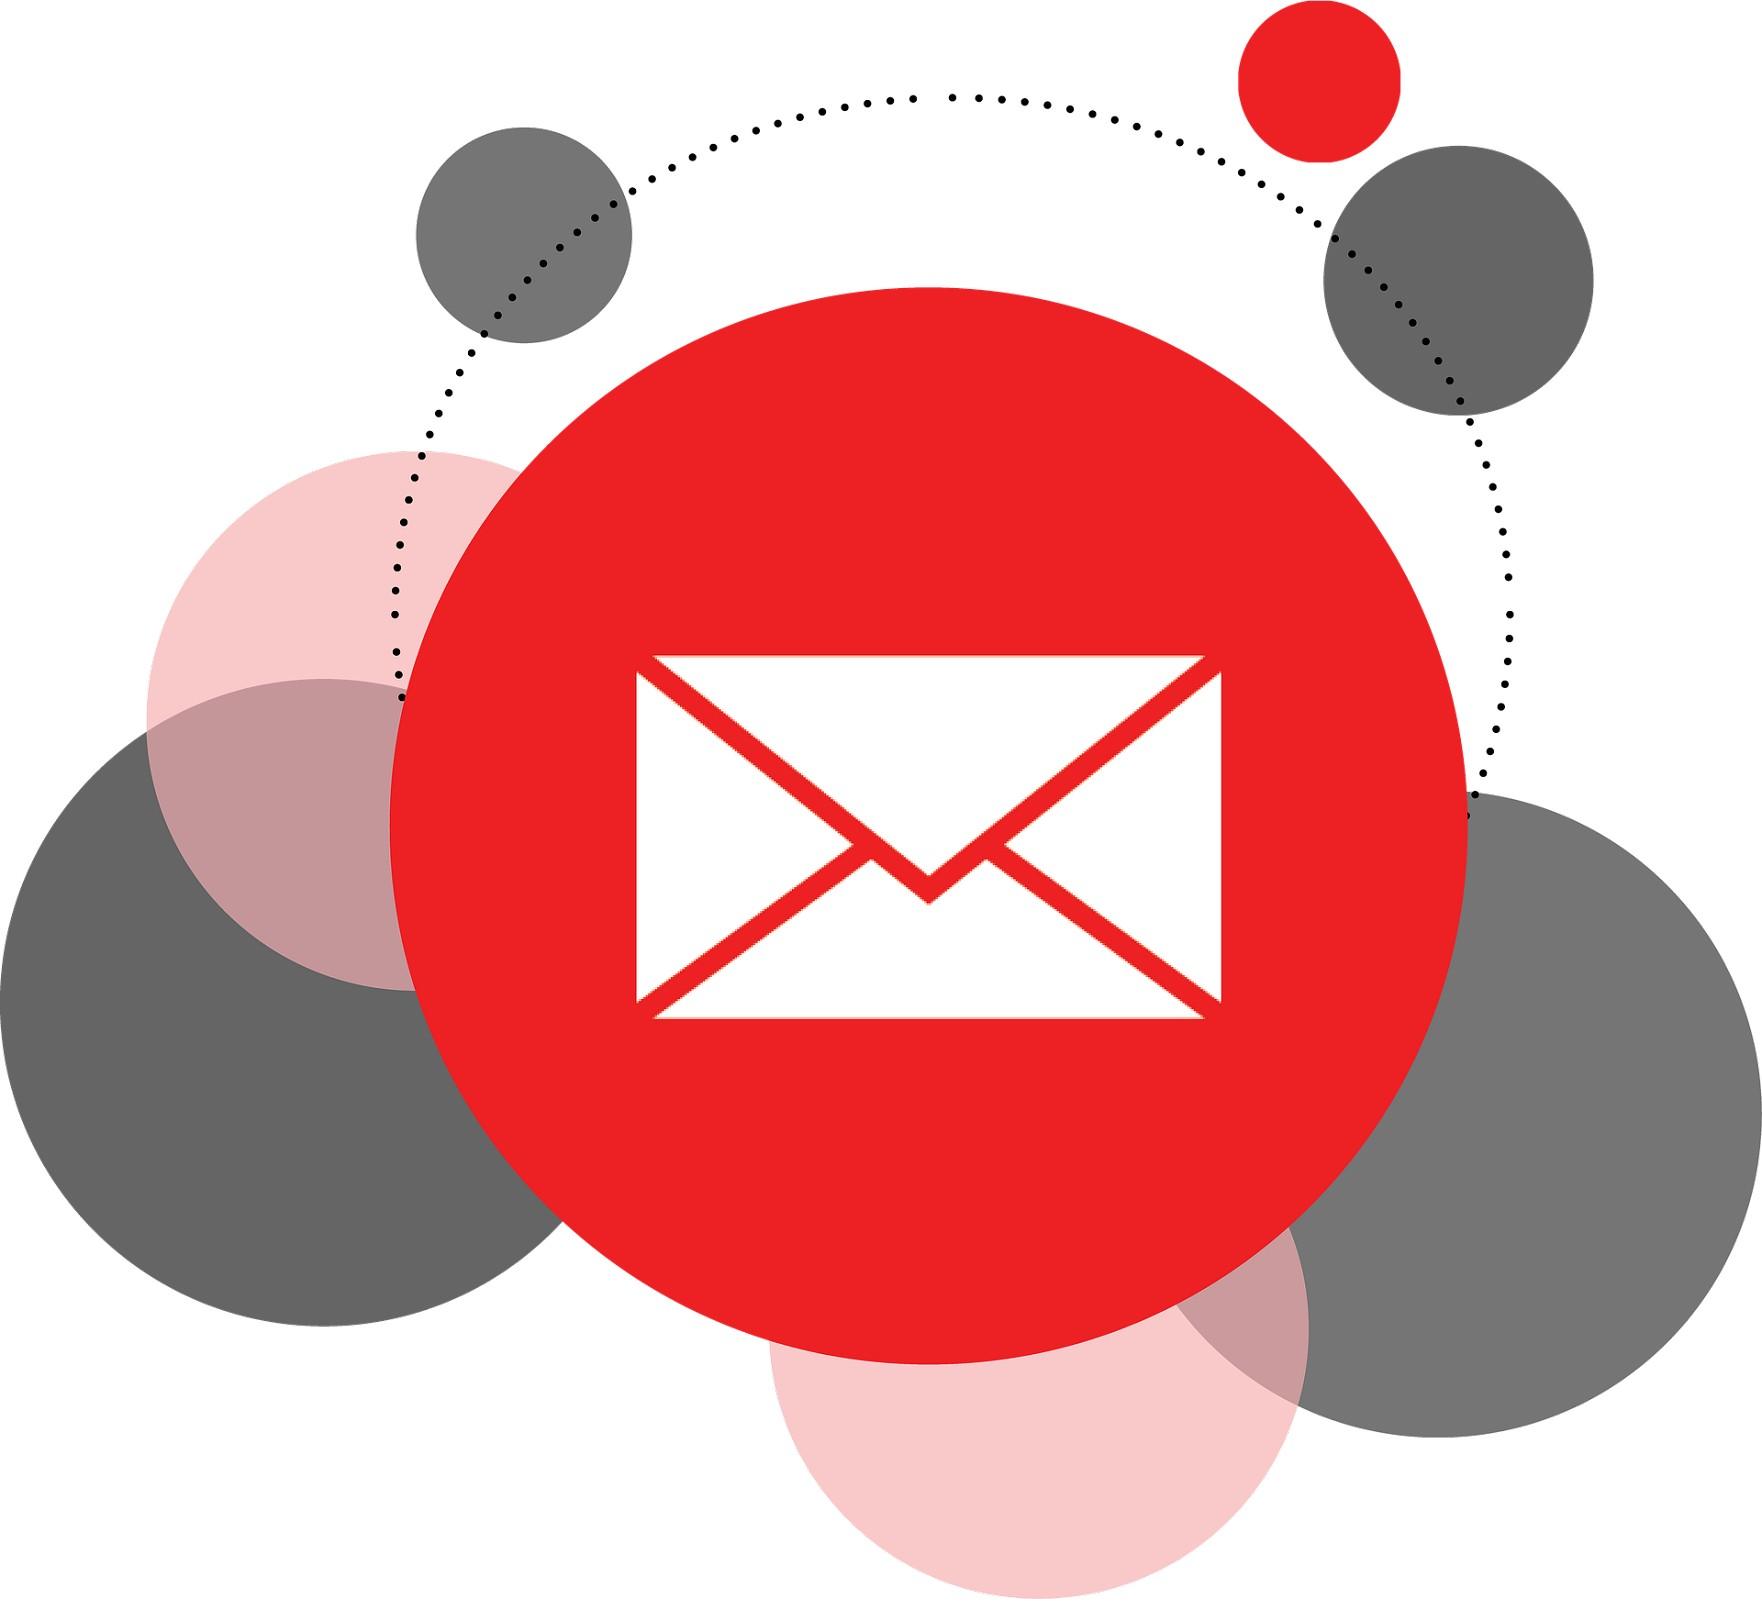 SMTPGET - bulk email server provider